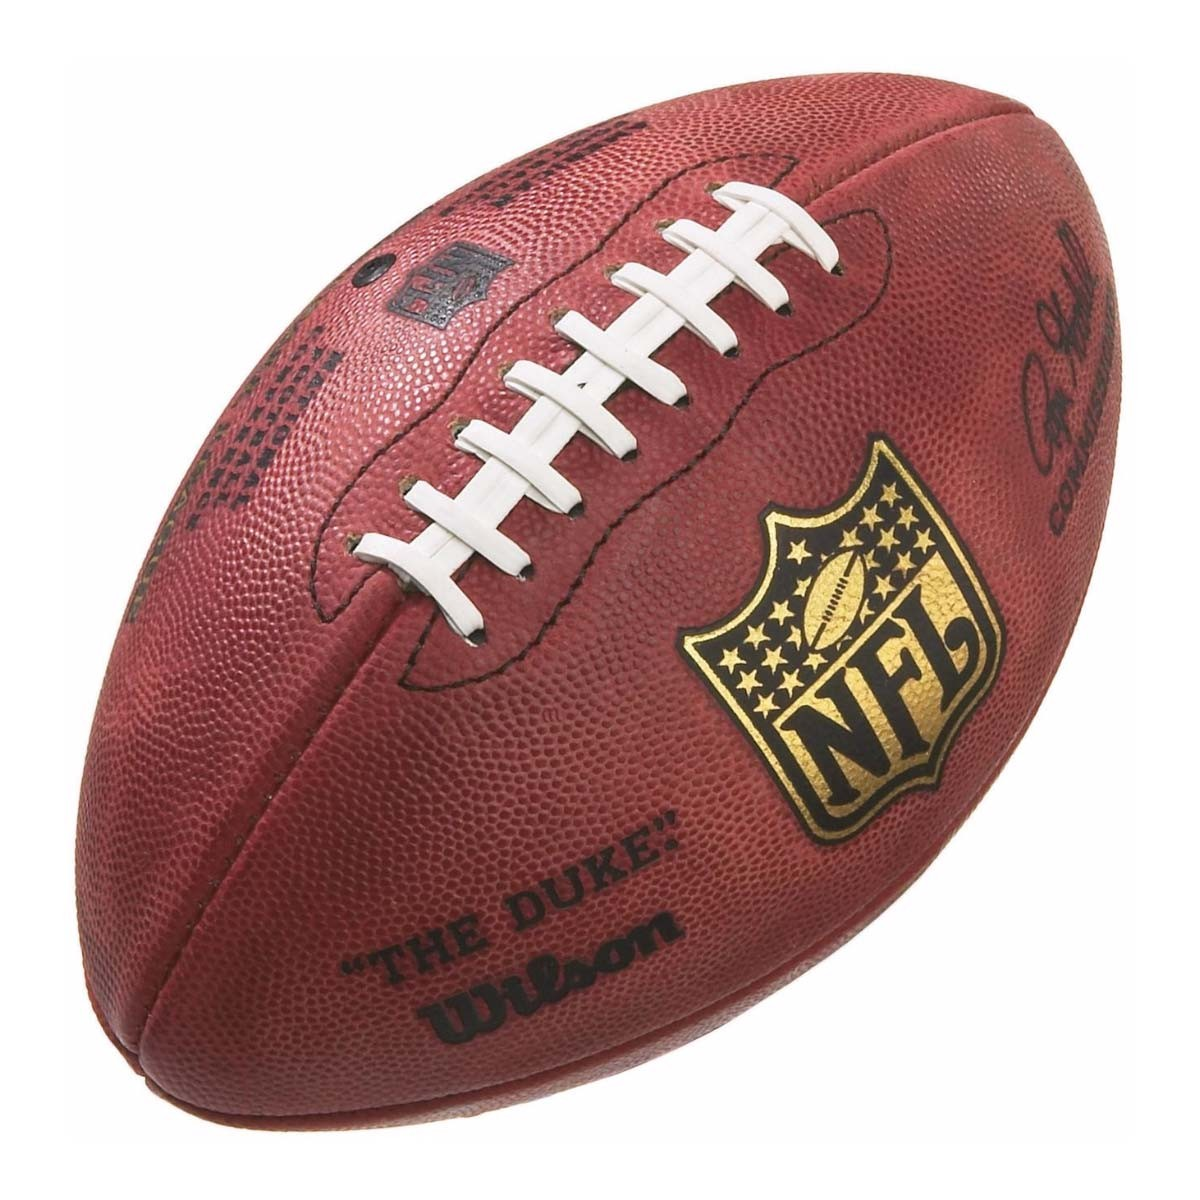 Wilson The Duke Official Nfl Football A47 500 Anthem